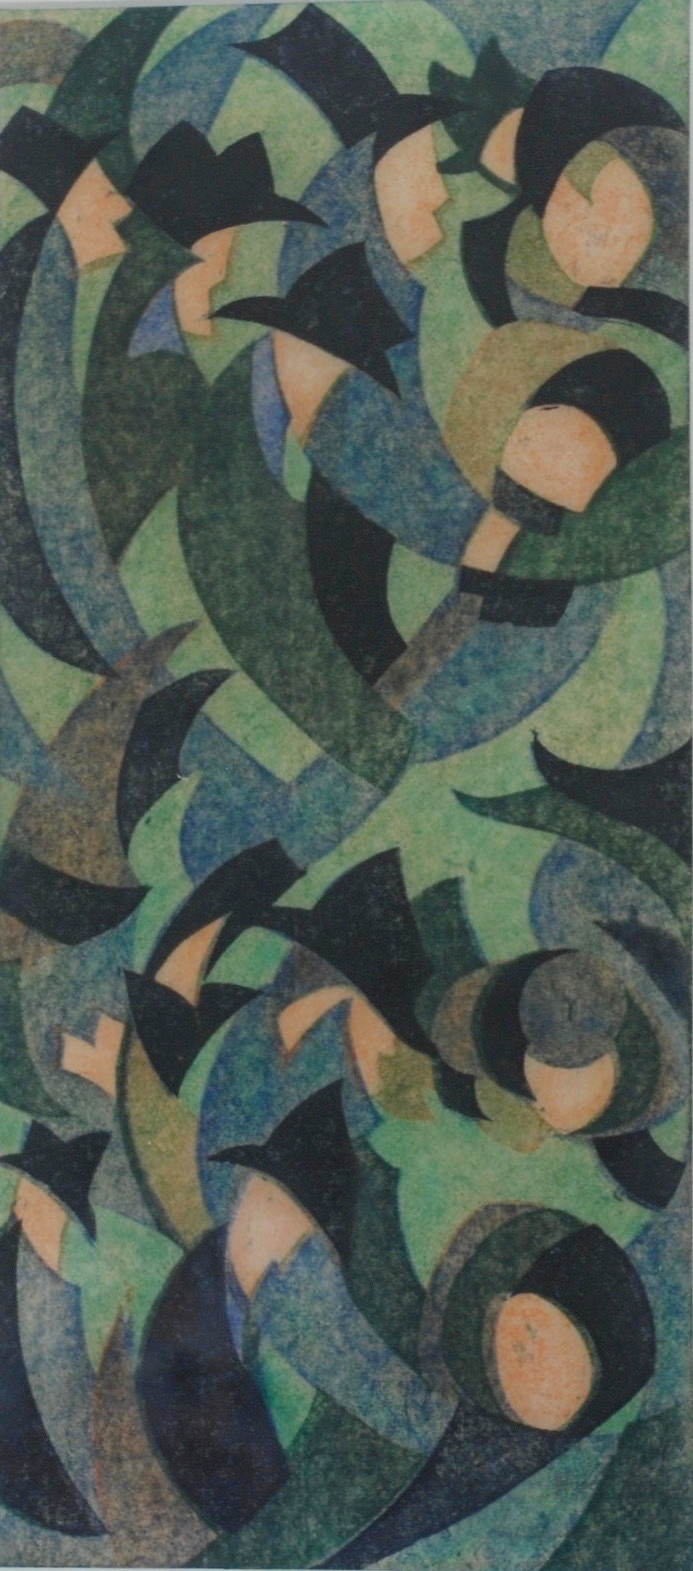 Sybil Andrews, Hyde Park, 1931